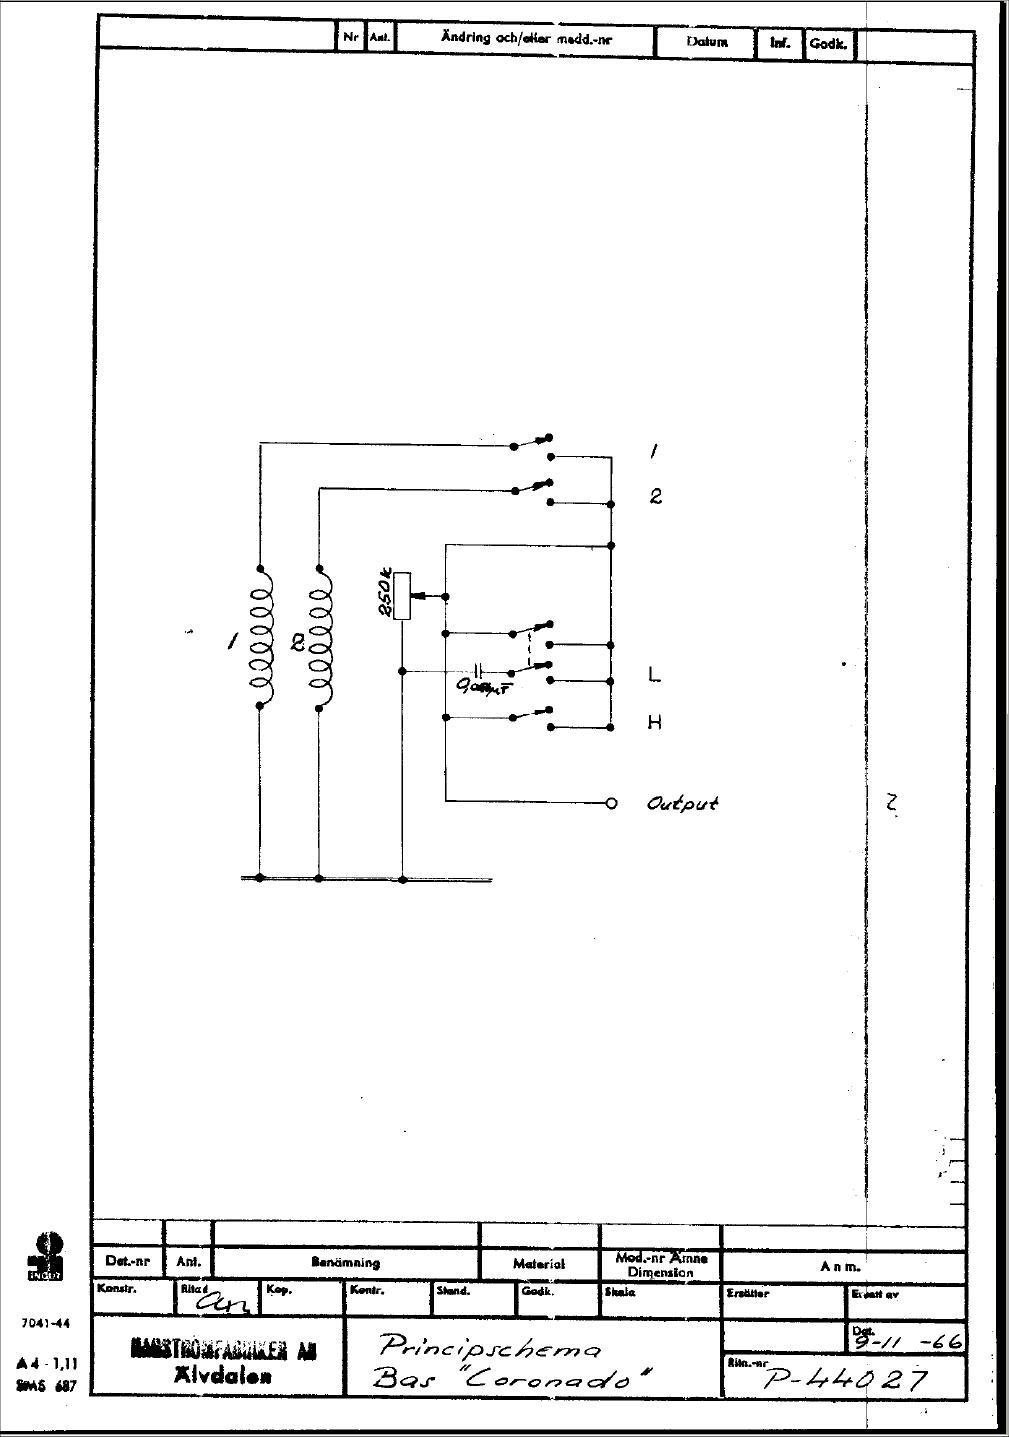 Hagstrom Wiring Diagram - Wiring Diagram Expert on harmony wiring diagram, ernie ball wiring diagram, krank wiring diagram, jbl wiring diagram, dimarzio wiring diagram, schecter wiring diagram, taylor wiring diagram, meyer wiring diagram, rickenbacker wiring diagram, carvin wiring diagram, danelectro wiring diagram, mitchell wiring diagram, gretsch wiring diagram, emg wiring diagram, gator wiring diagram, epiphone wiring diagram, mosrite wiring diagram, bass boat wiring diagram, jackson wiring diagram, michael kelly wiring diagram,